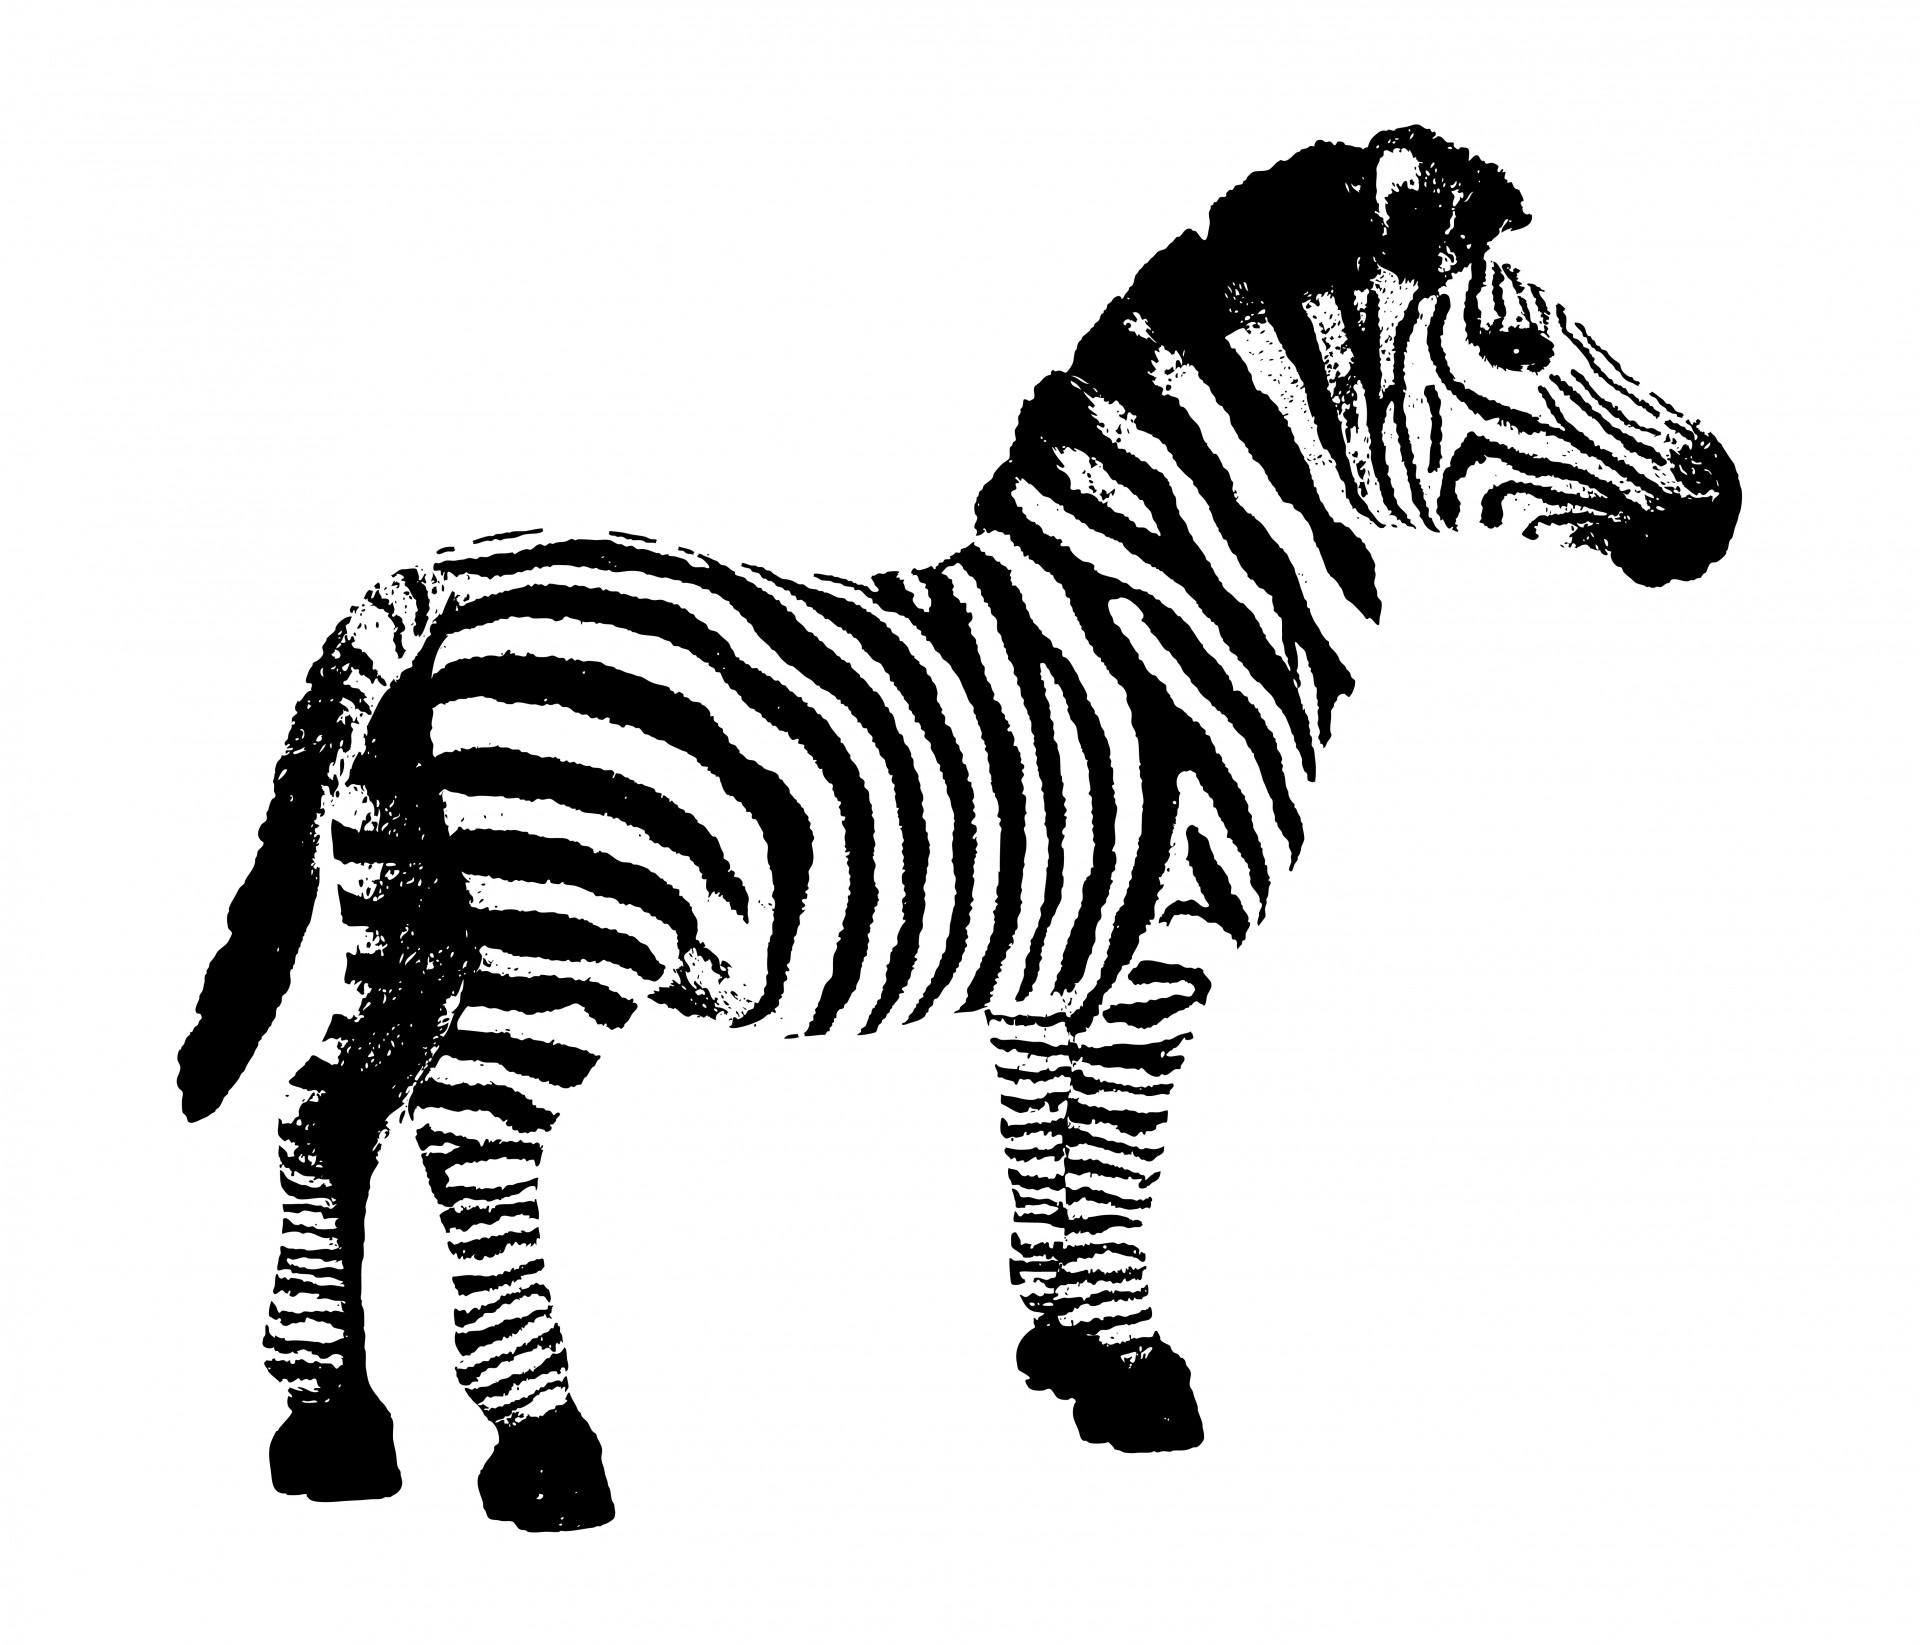 Zebra Clipart Free Stock Photo